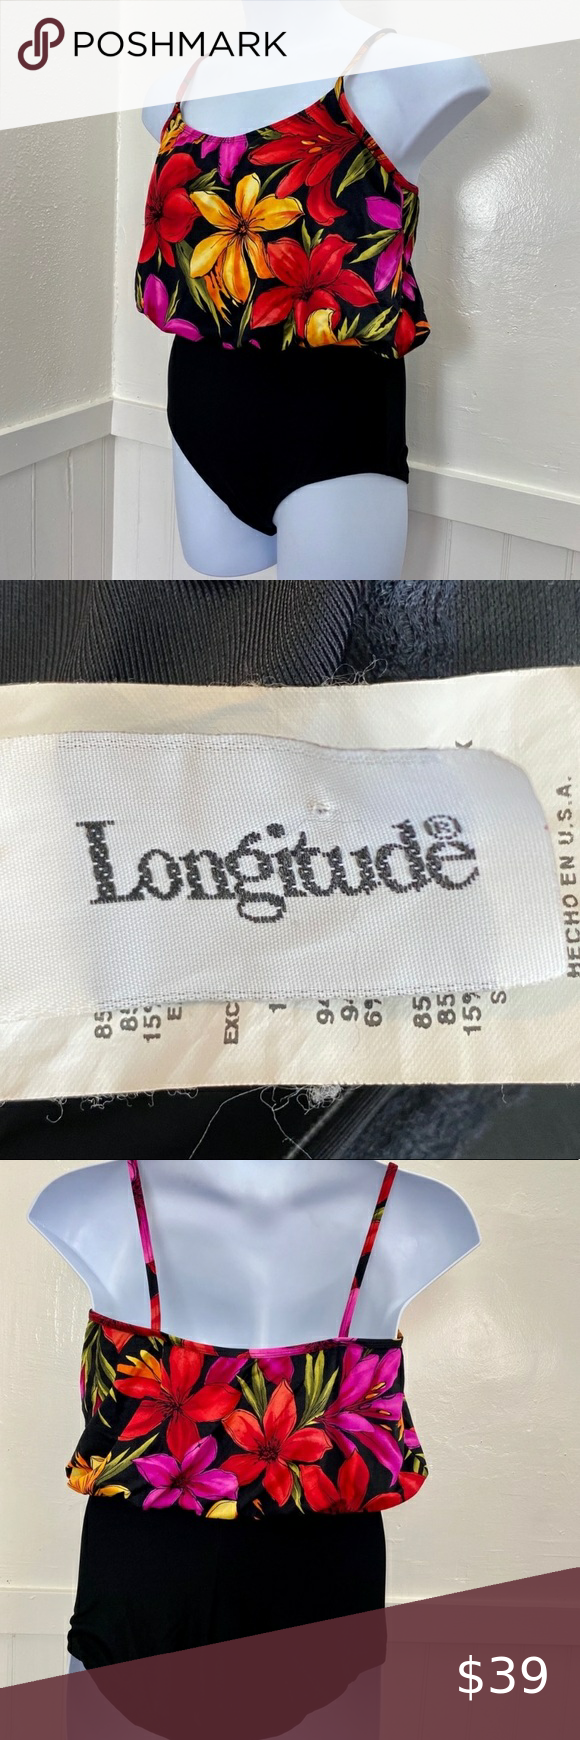 Longitude Women's One Piece Swimsuit EUC   14 Long